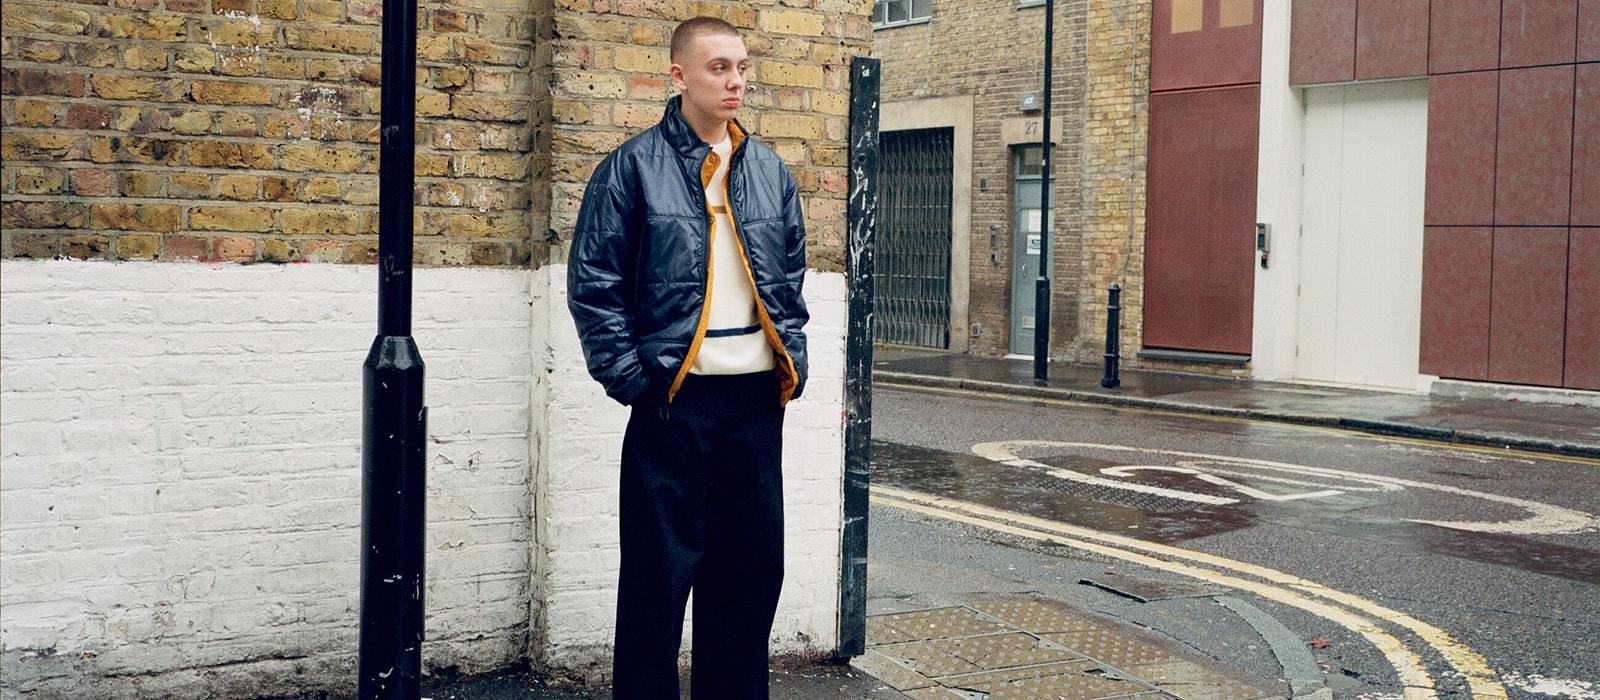 Aitch Aitch20 Moston Manchester Rapper Musician Bugzy Malone IAMDDB Ed Sheeran Take Me Back to London EP Jaykae Stormzy